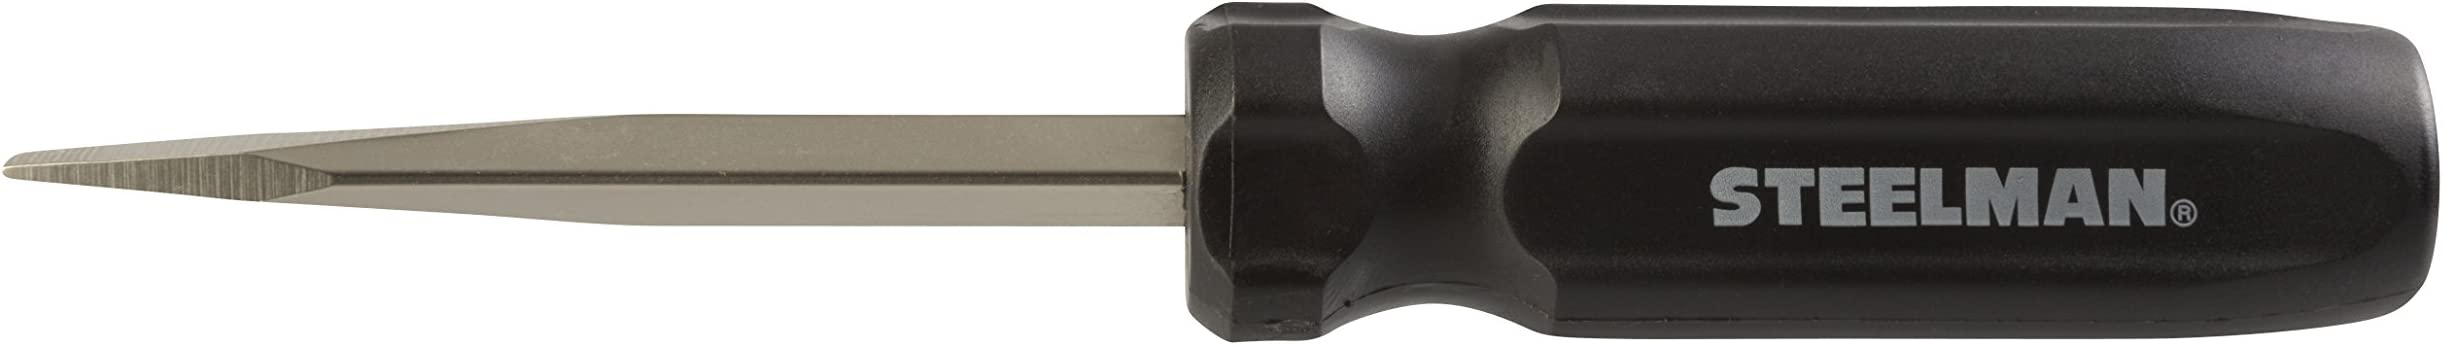 STEELMAN 31043 5//16 x 4-Inch Slotted Screwdriver